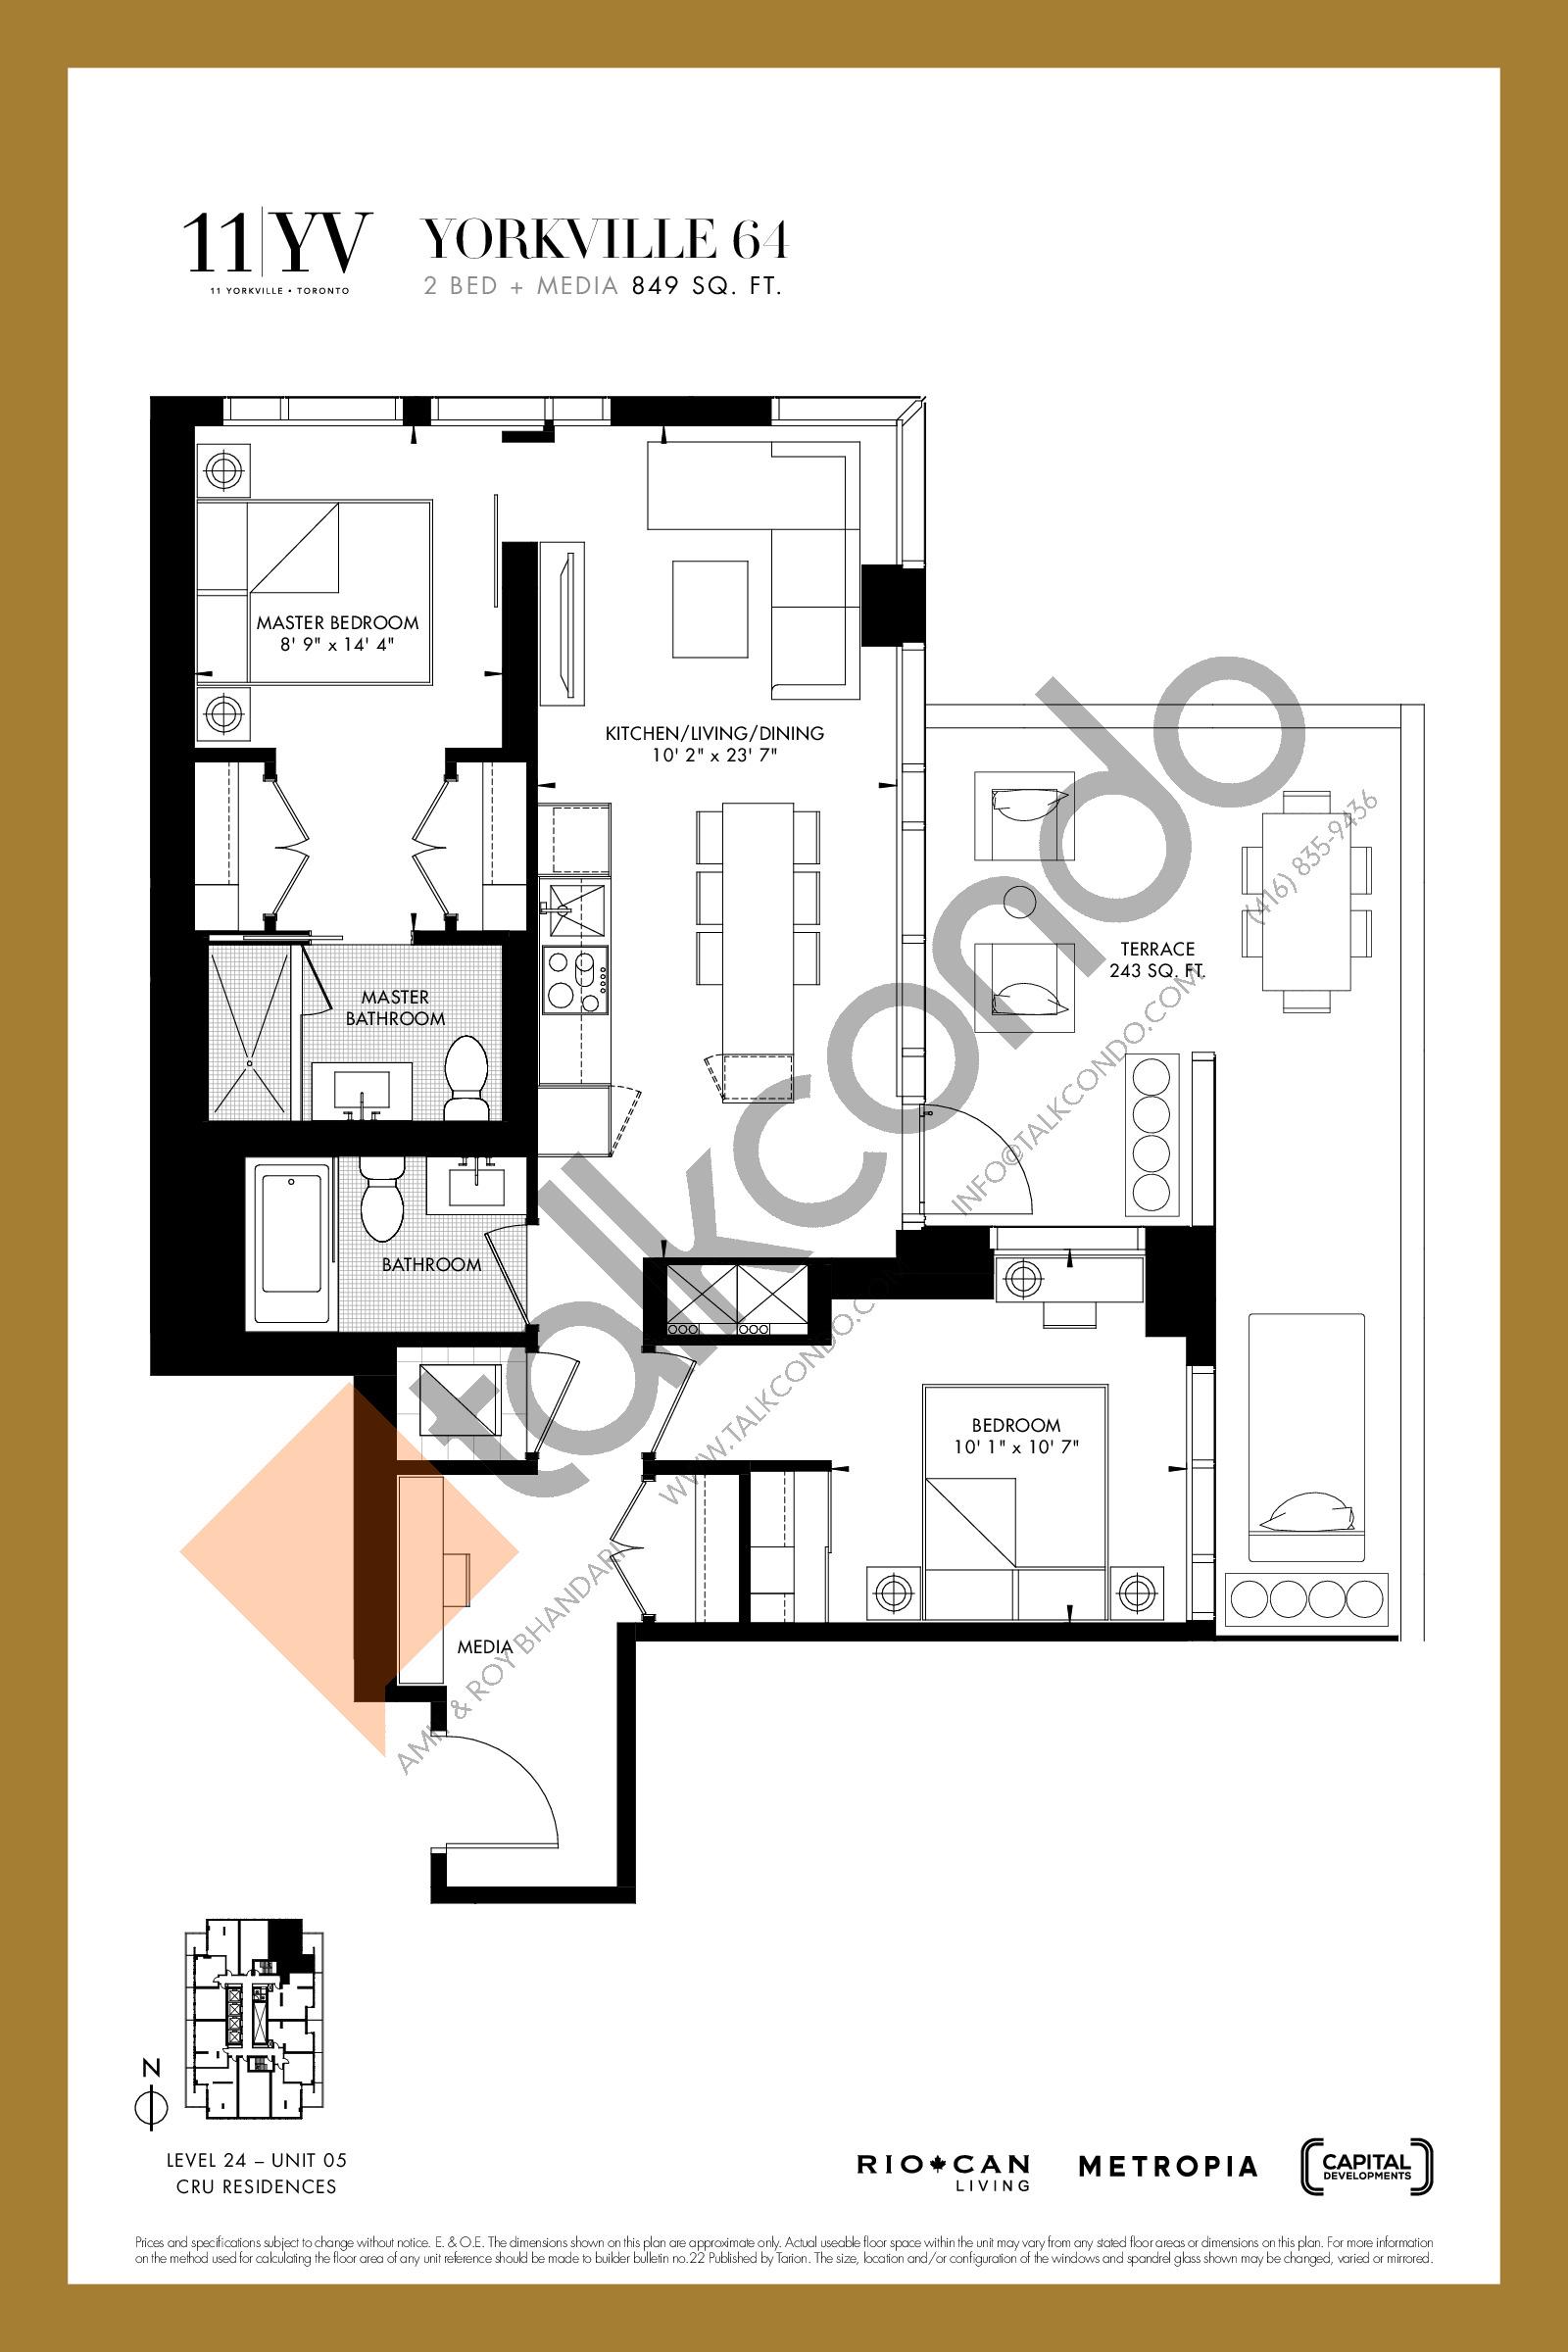 Yorkville 64 Floor Plan at 11YV Condos - 849 sq.ft